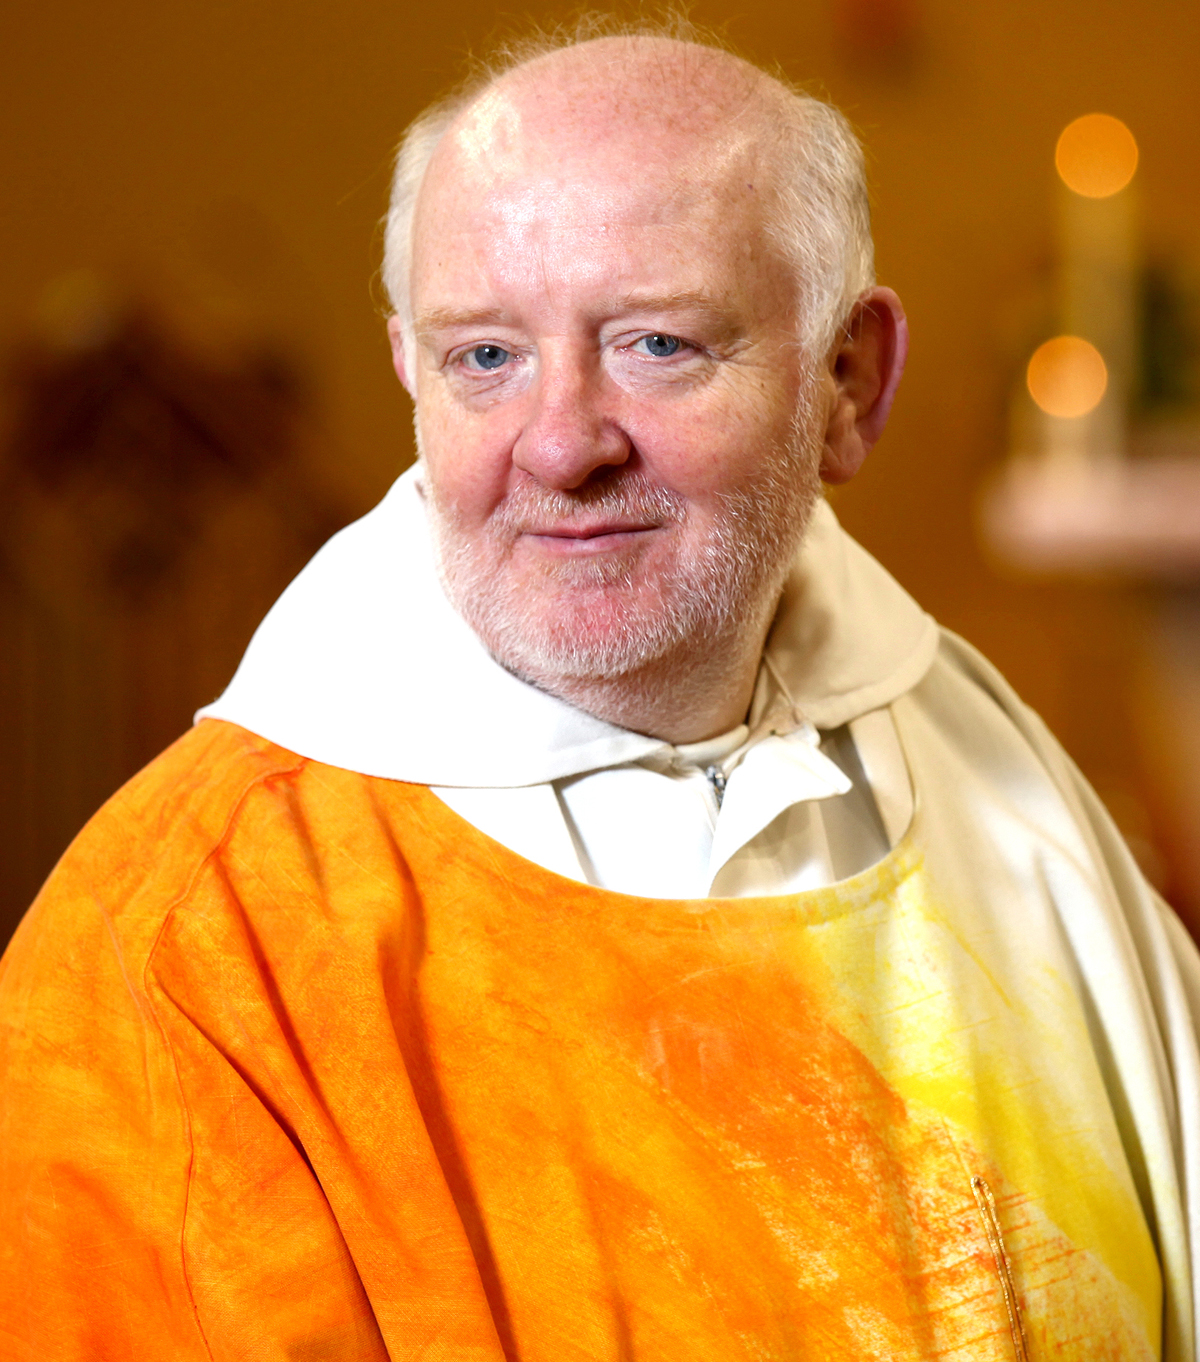 St. Mary's New Catholic Priest